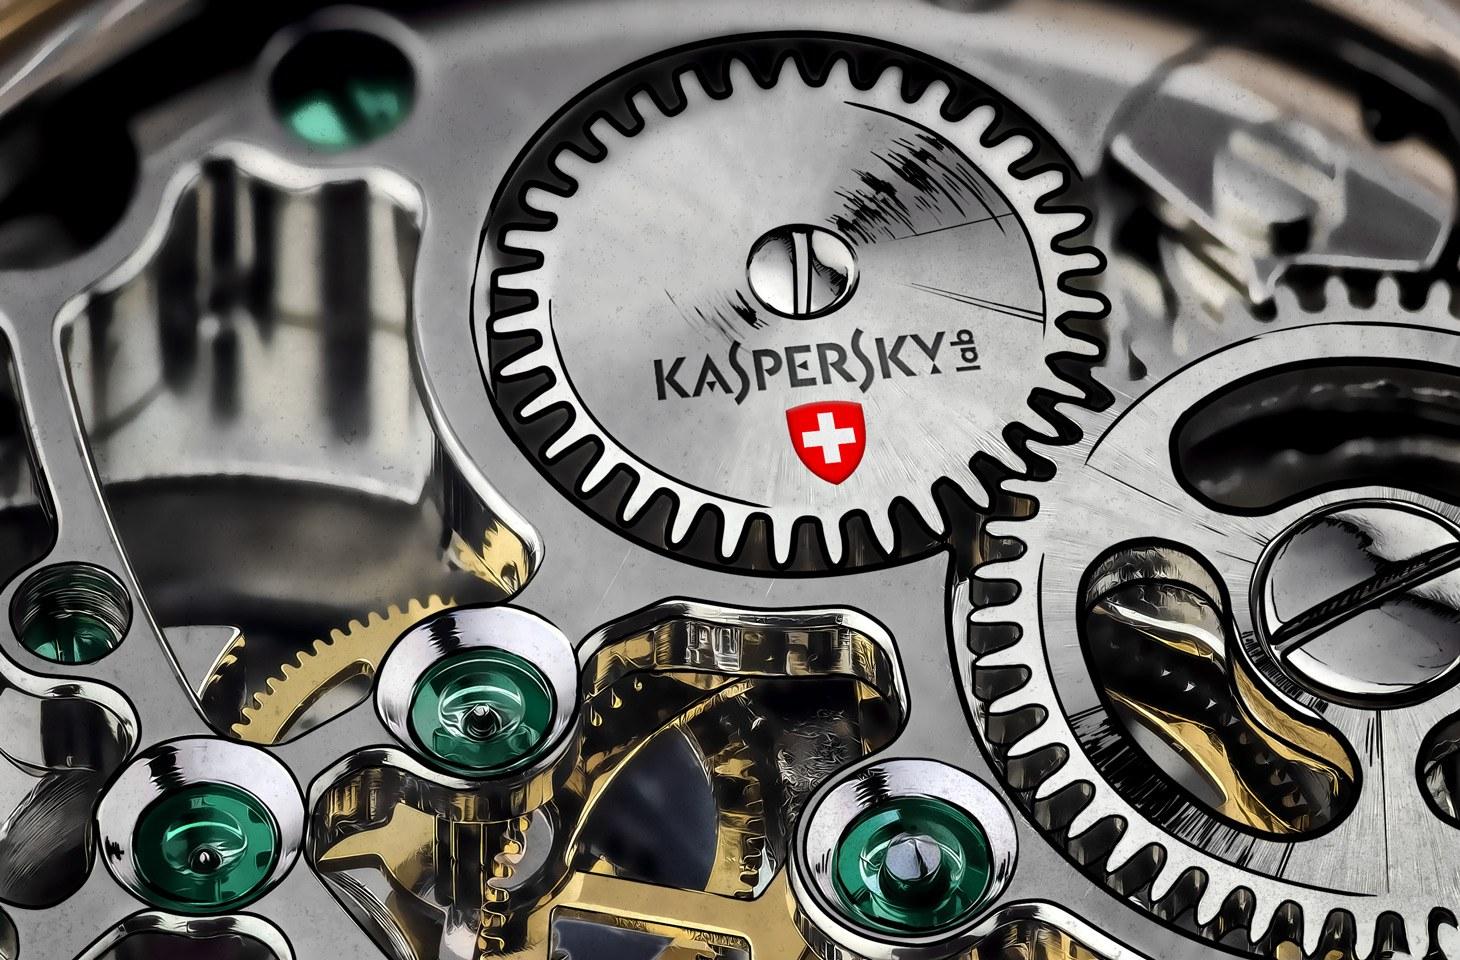 Primul raport Kaspersky privind transparența